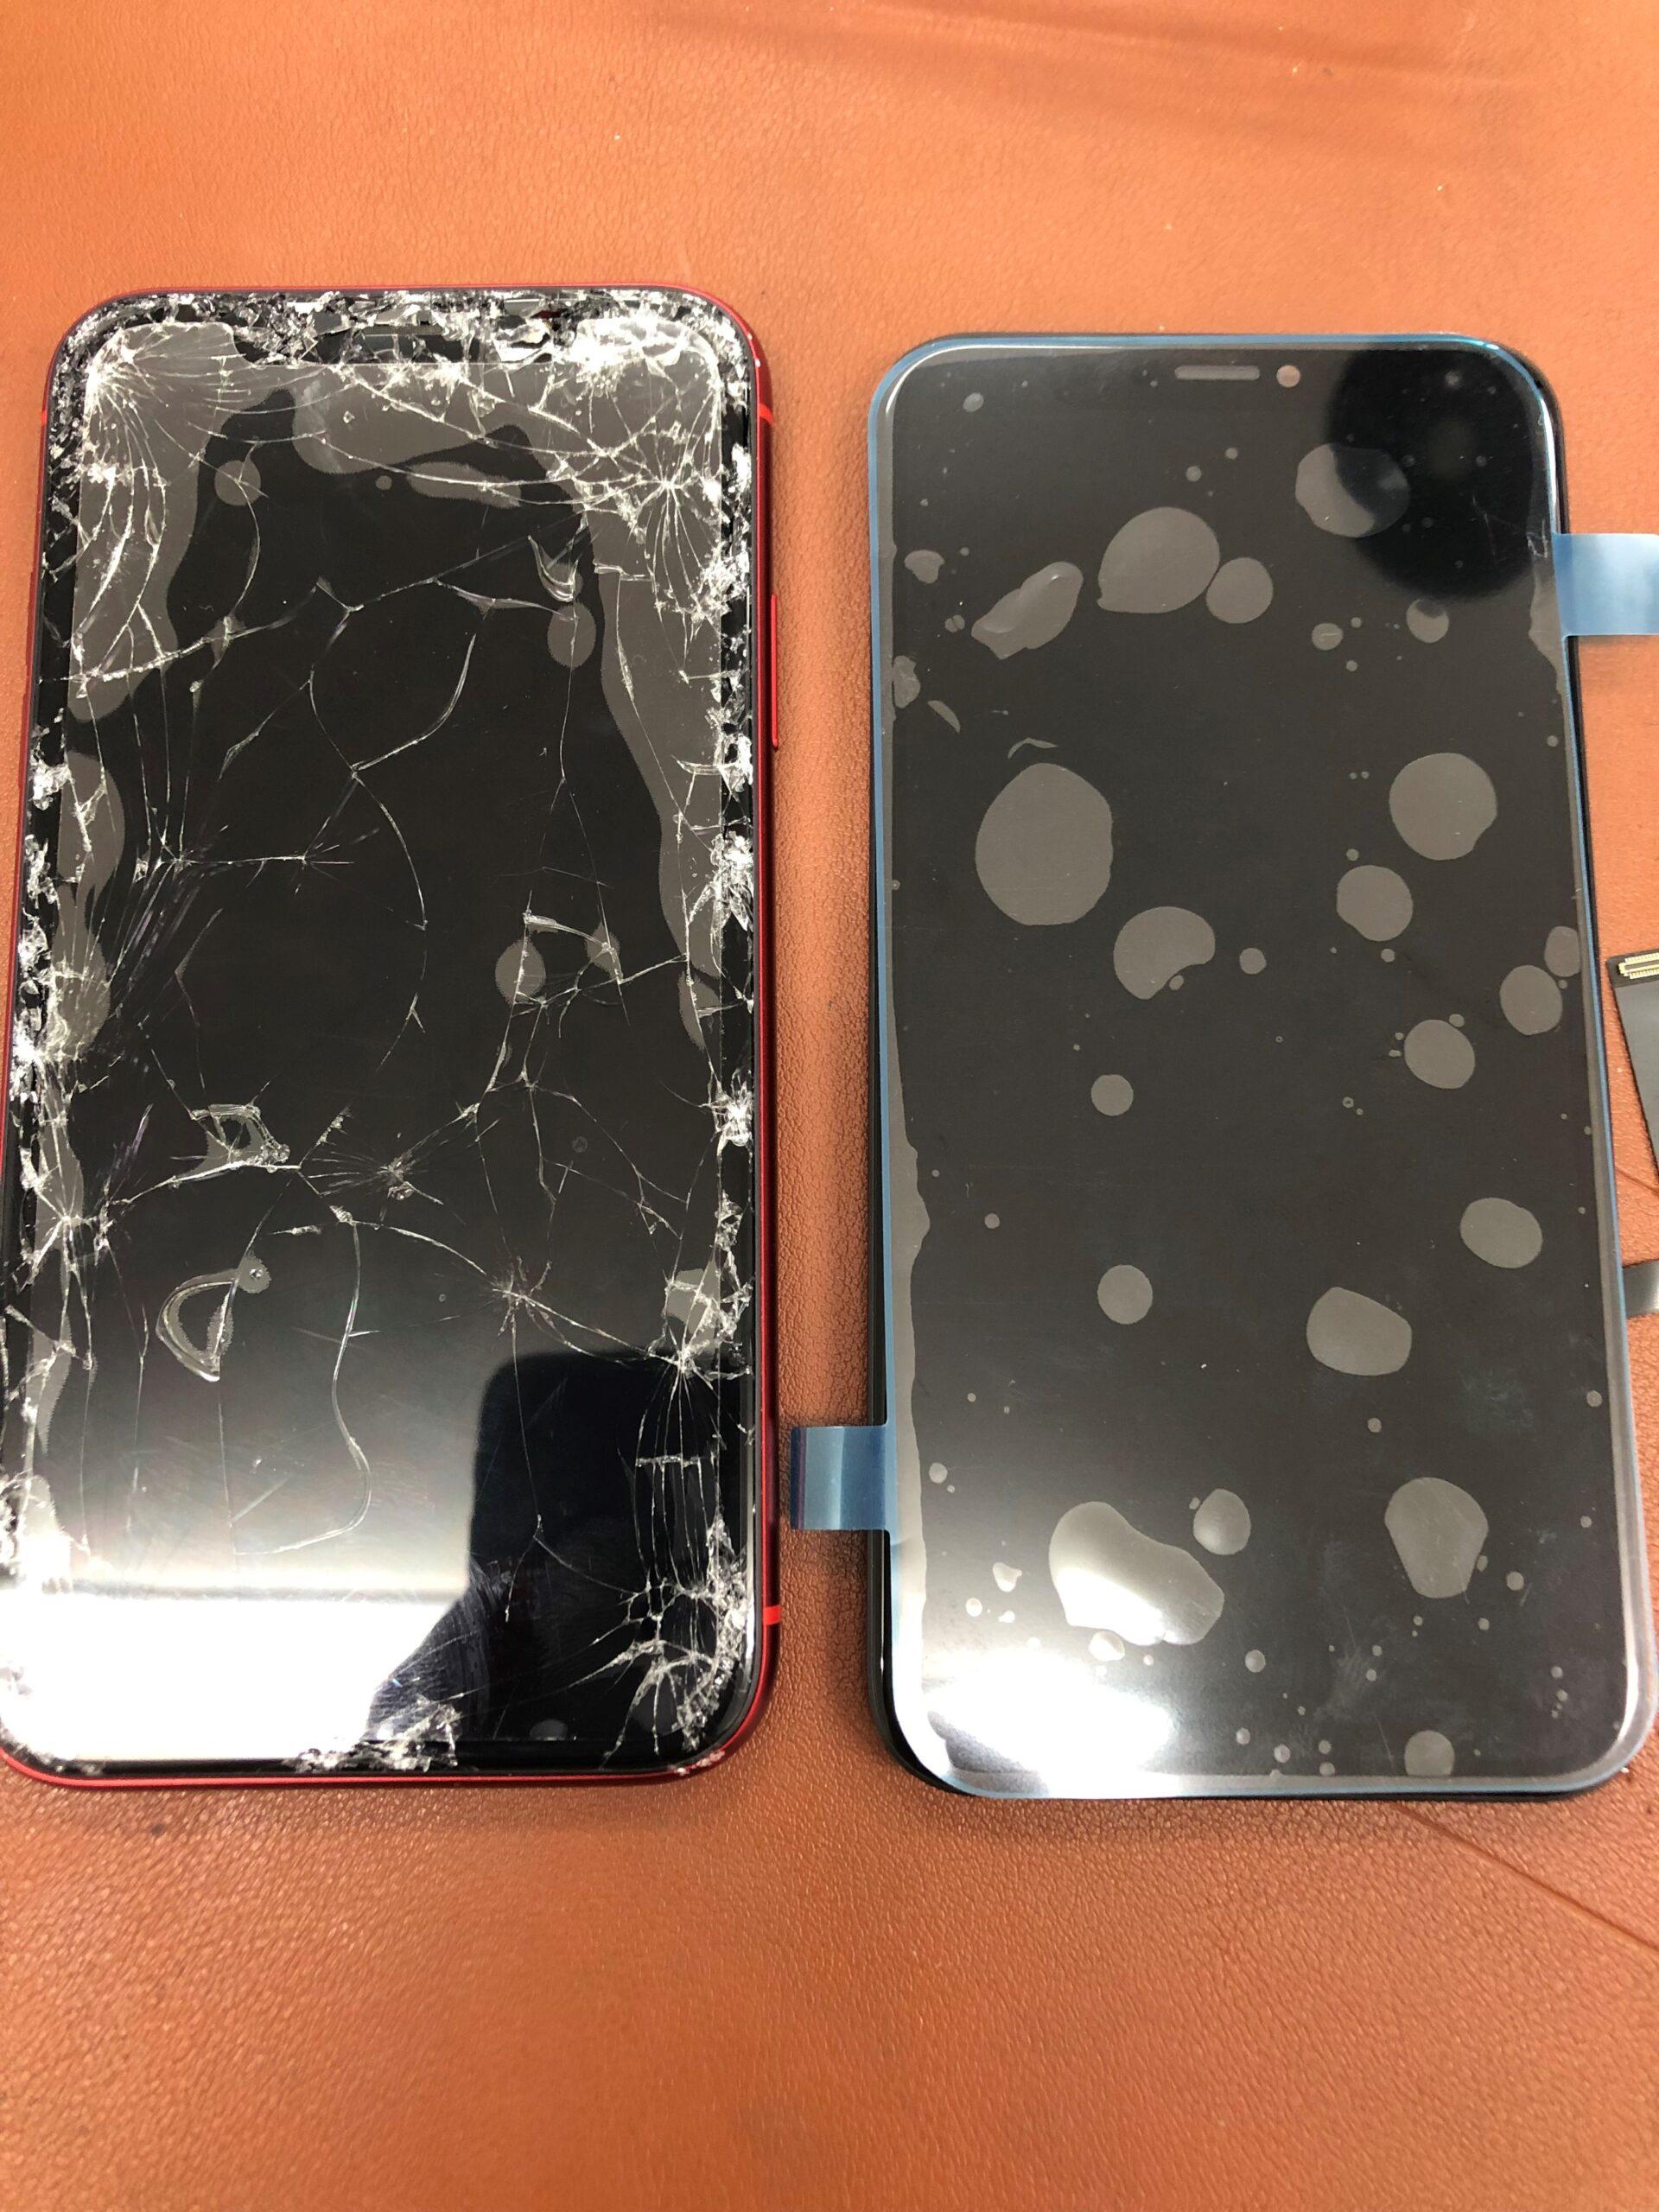 iphoneXSガラス割れ2019年7月